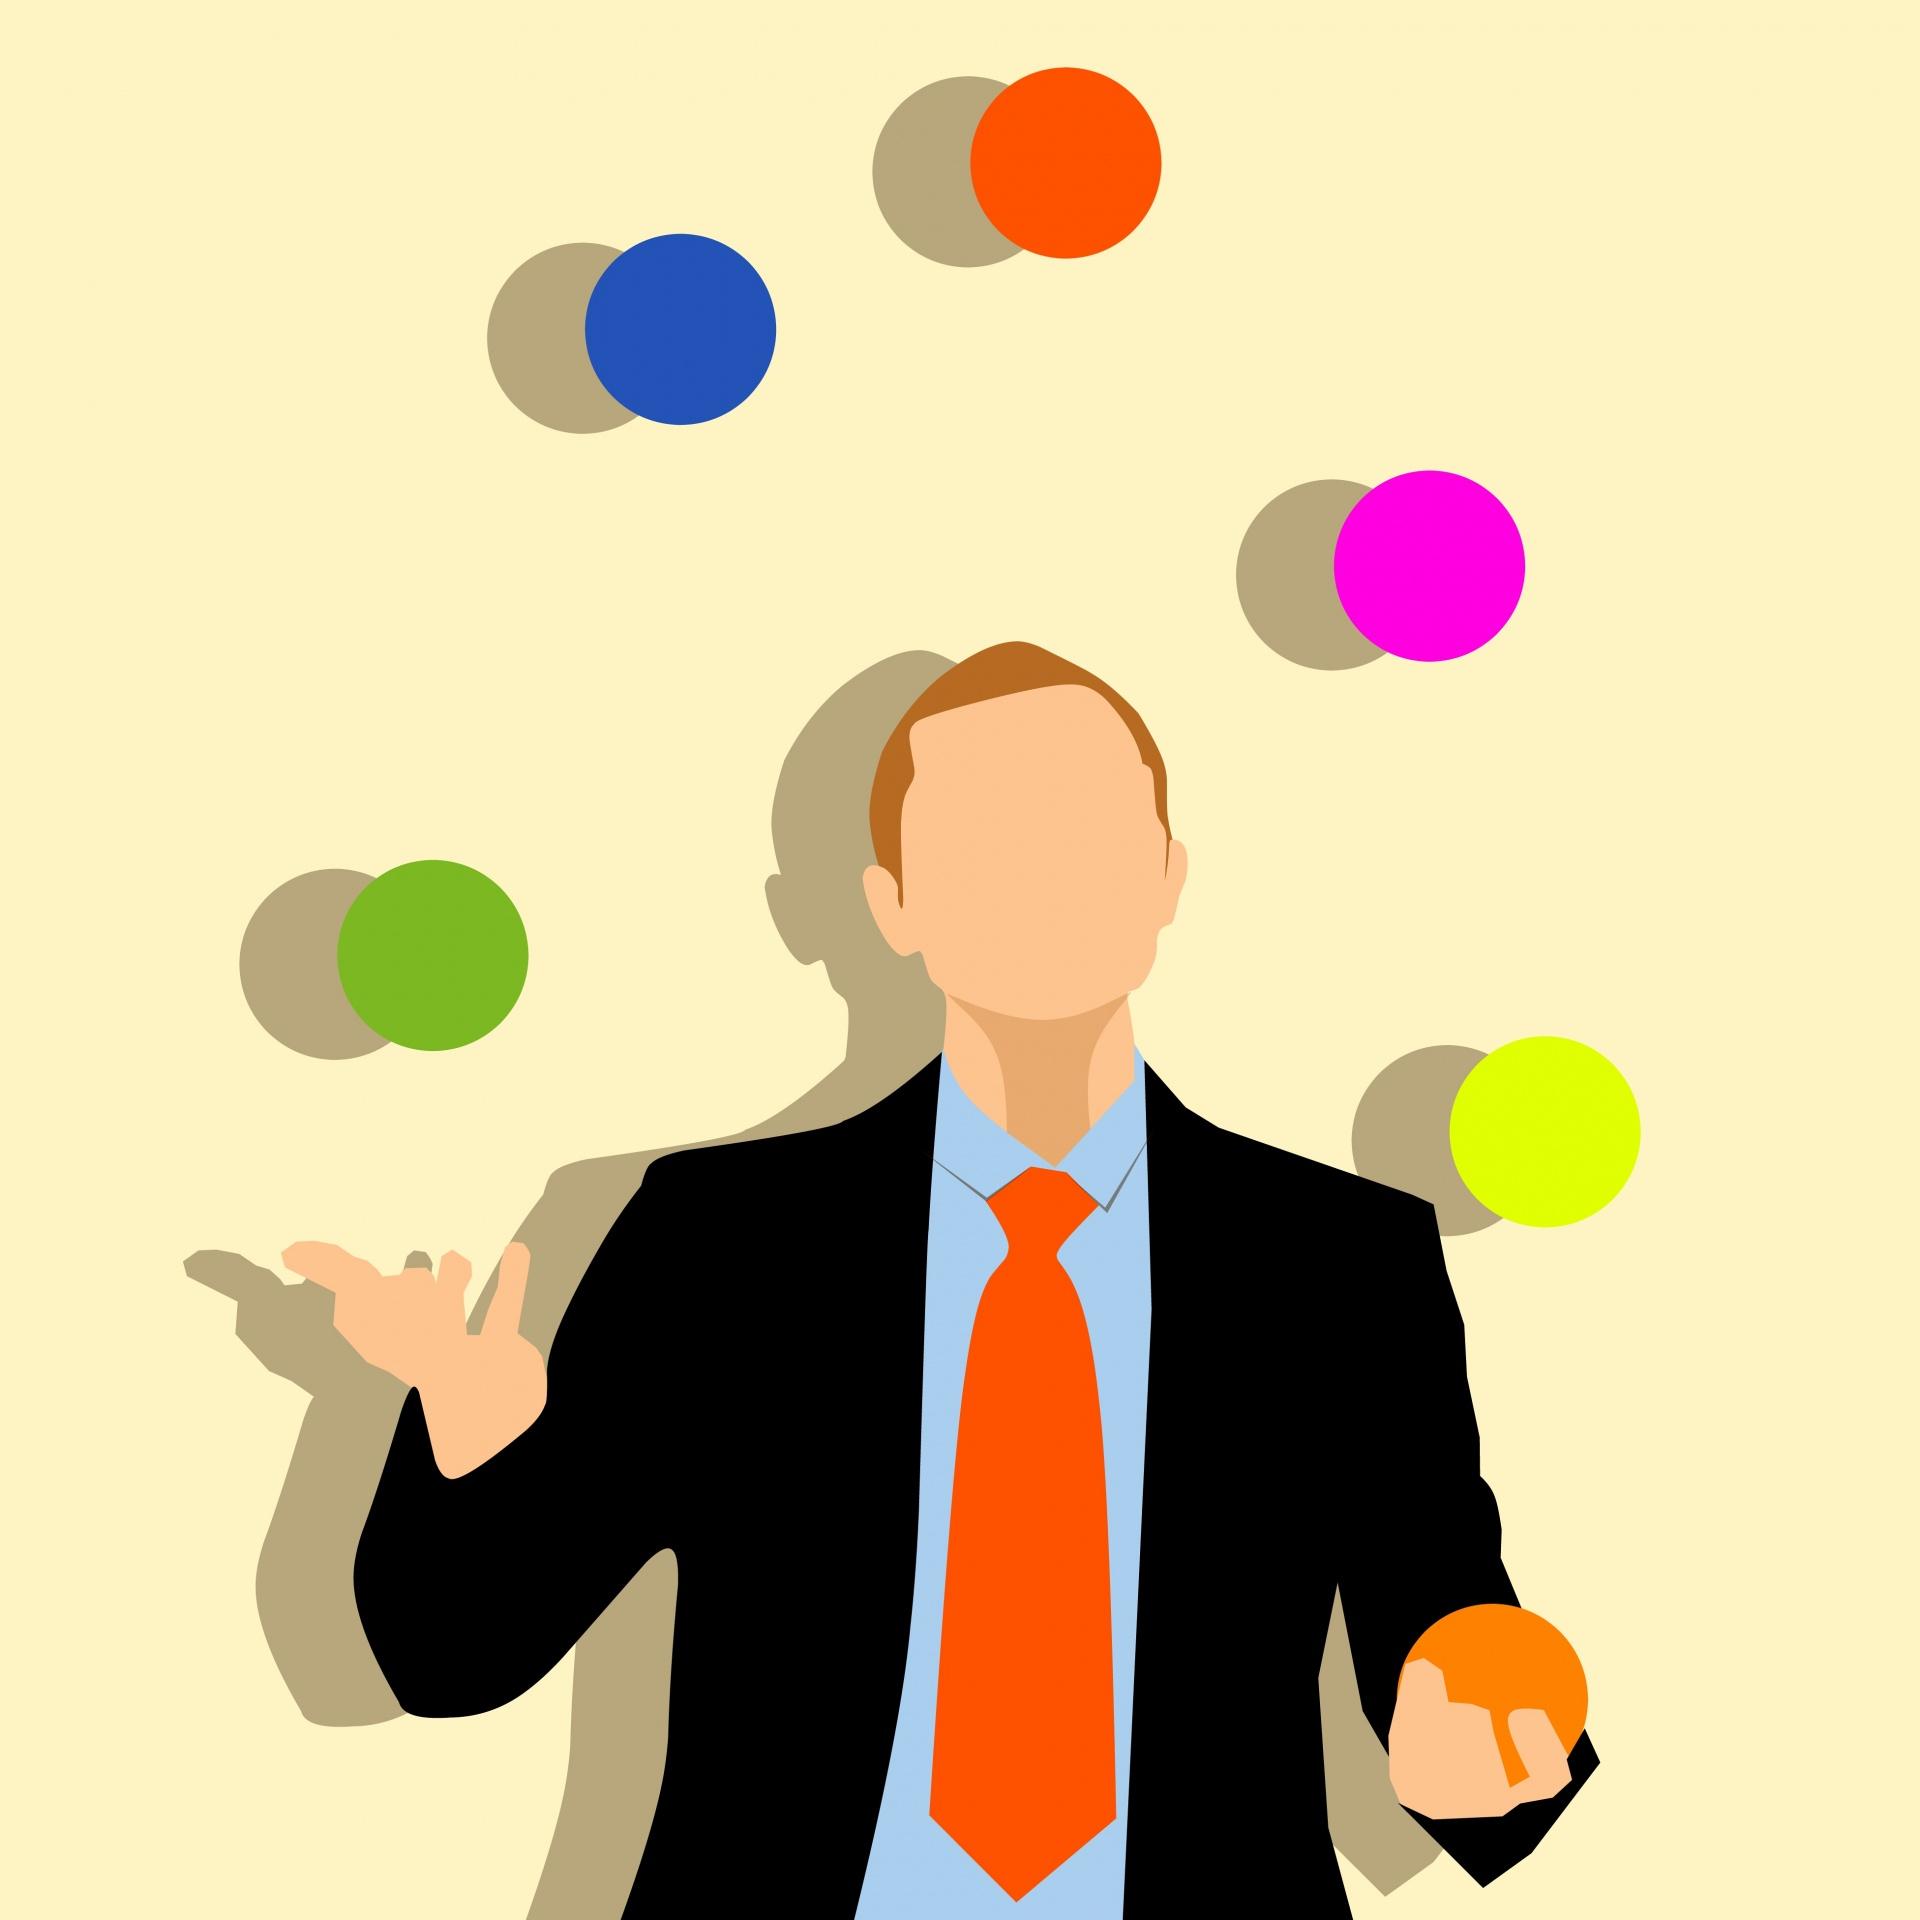 man-juggling-balls